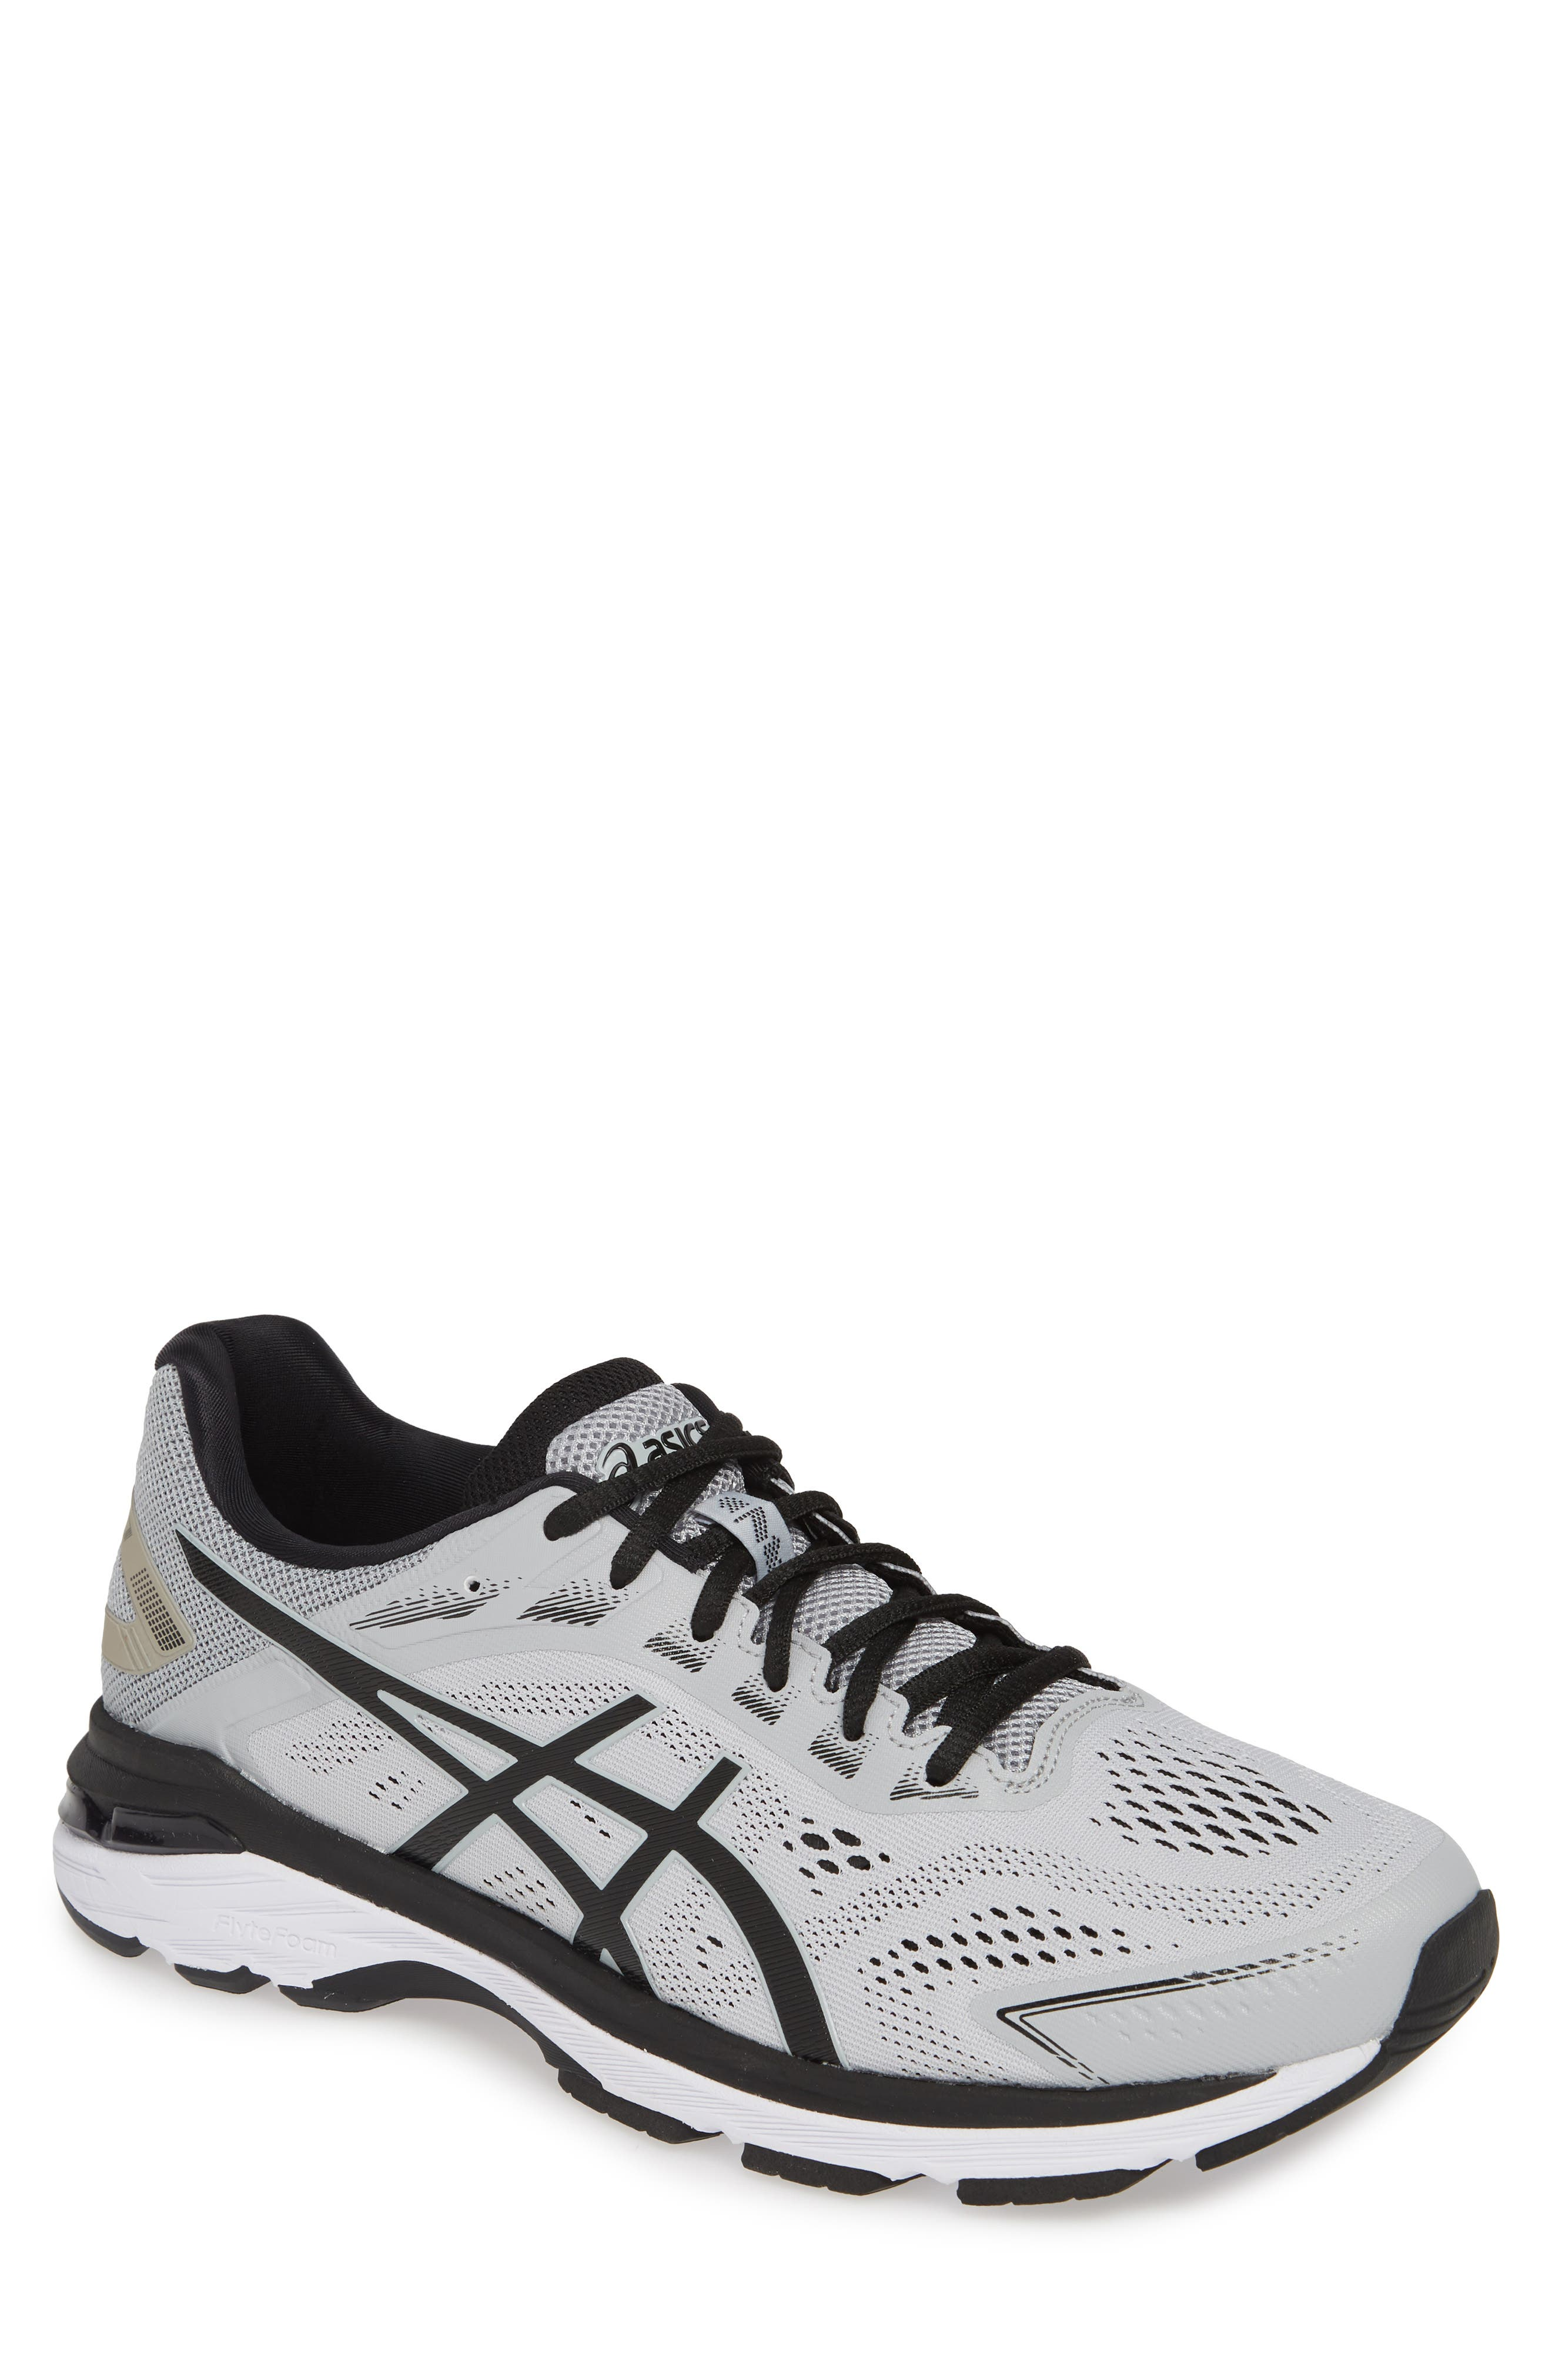 GT-2000 7 Running Shoe, Main, color, MID GREY/ BLACK